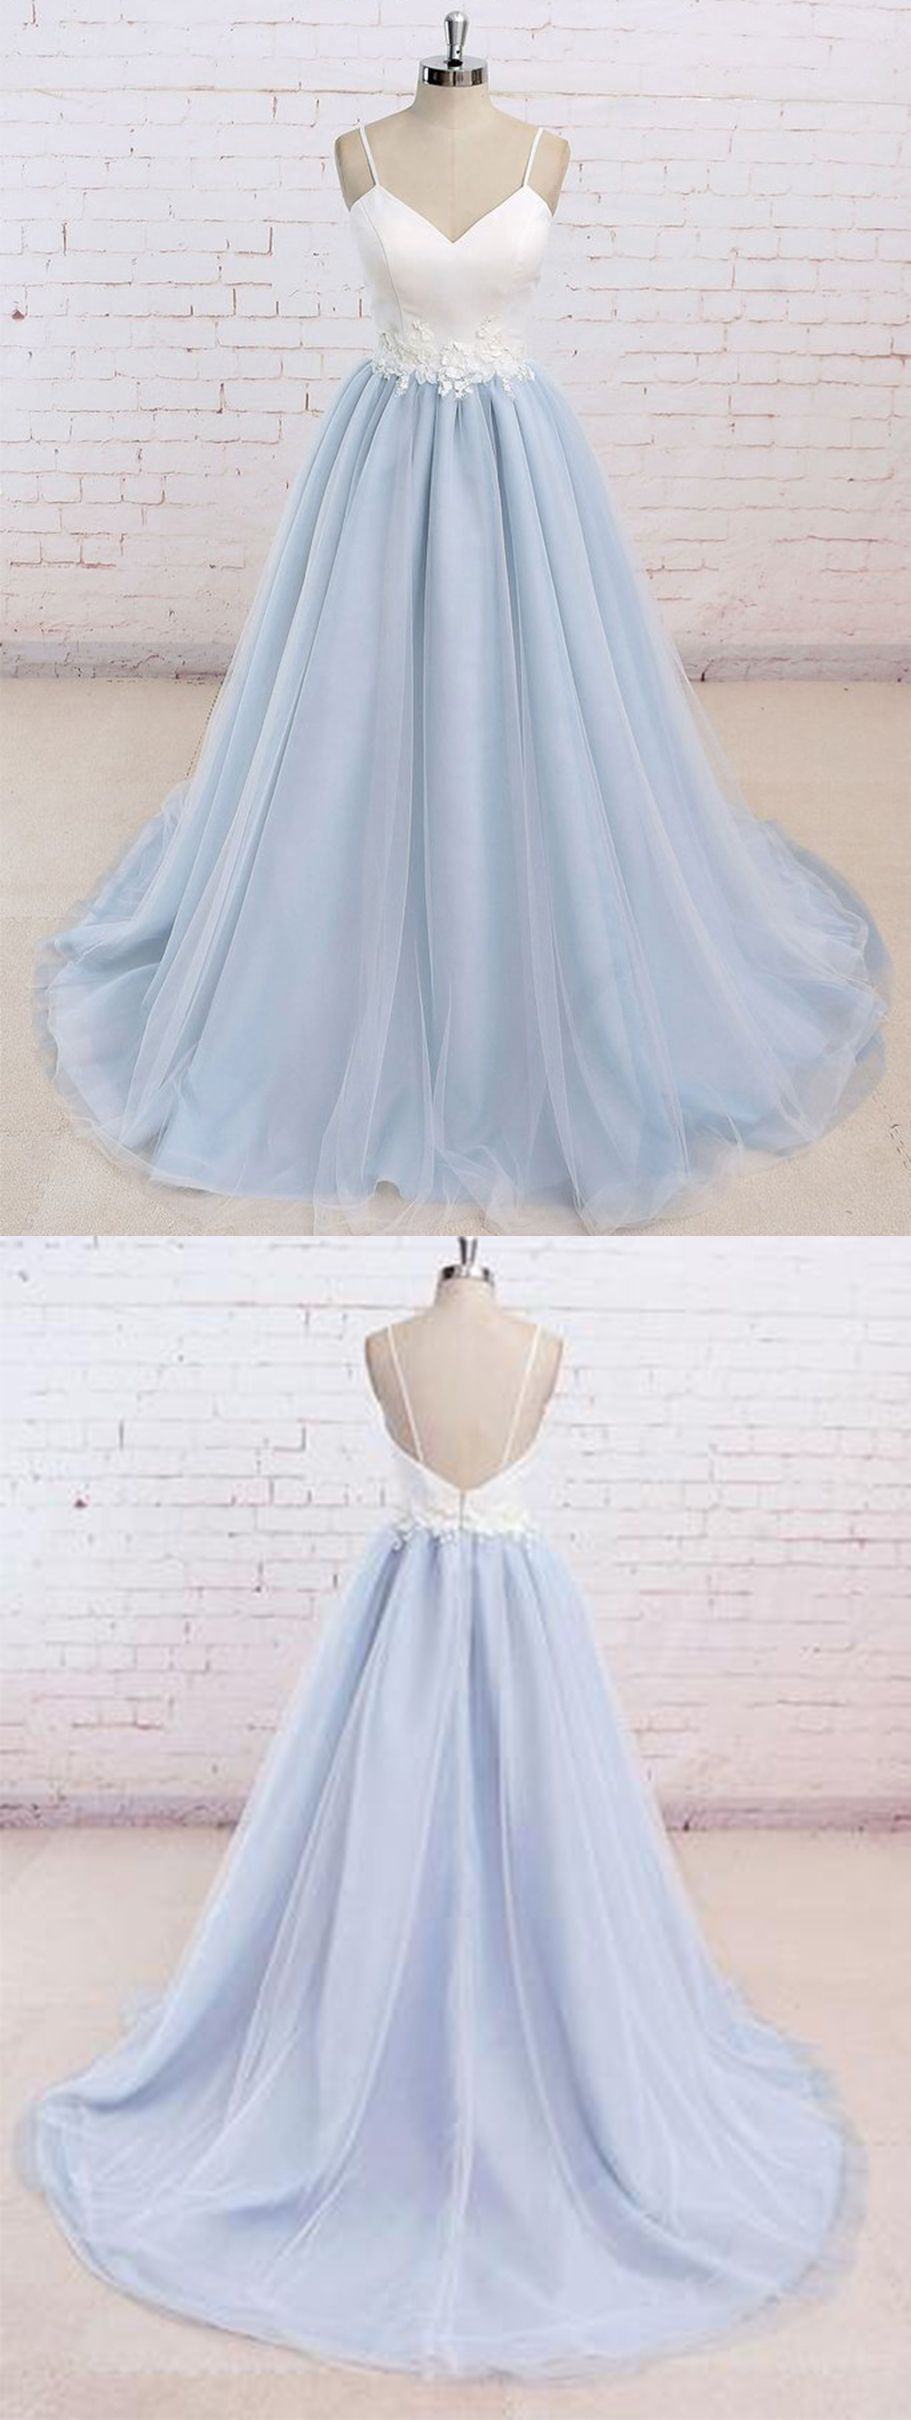 Long prom dressesbaby blue prom dresssimple prom dressessenior